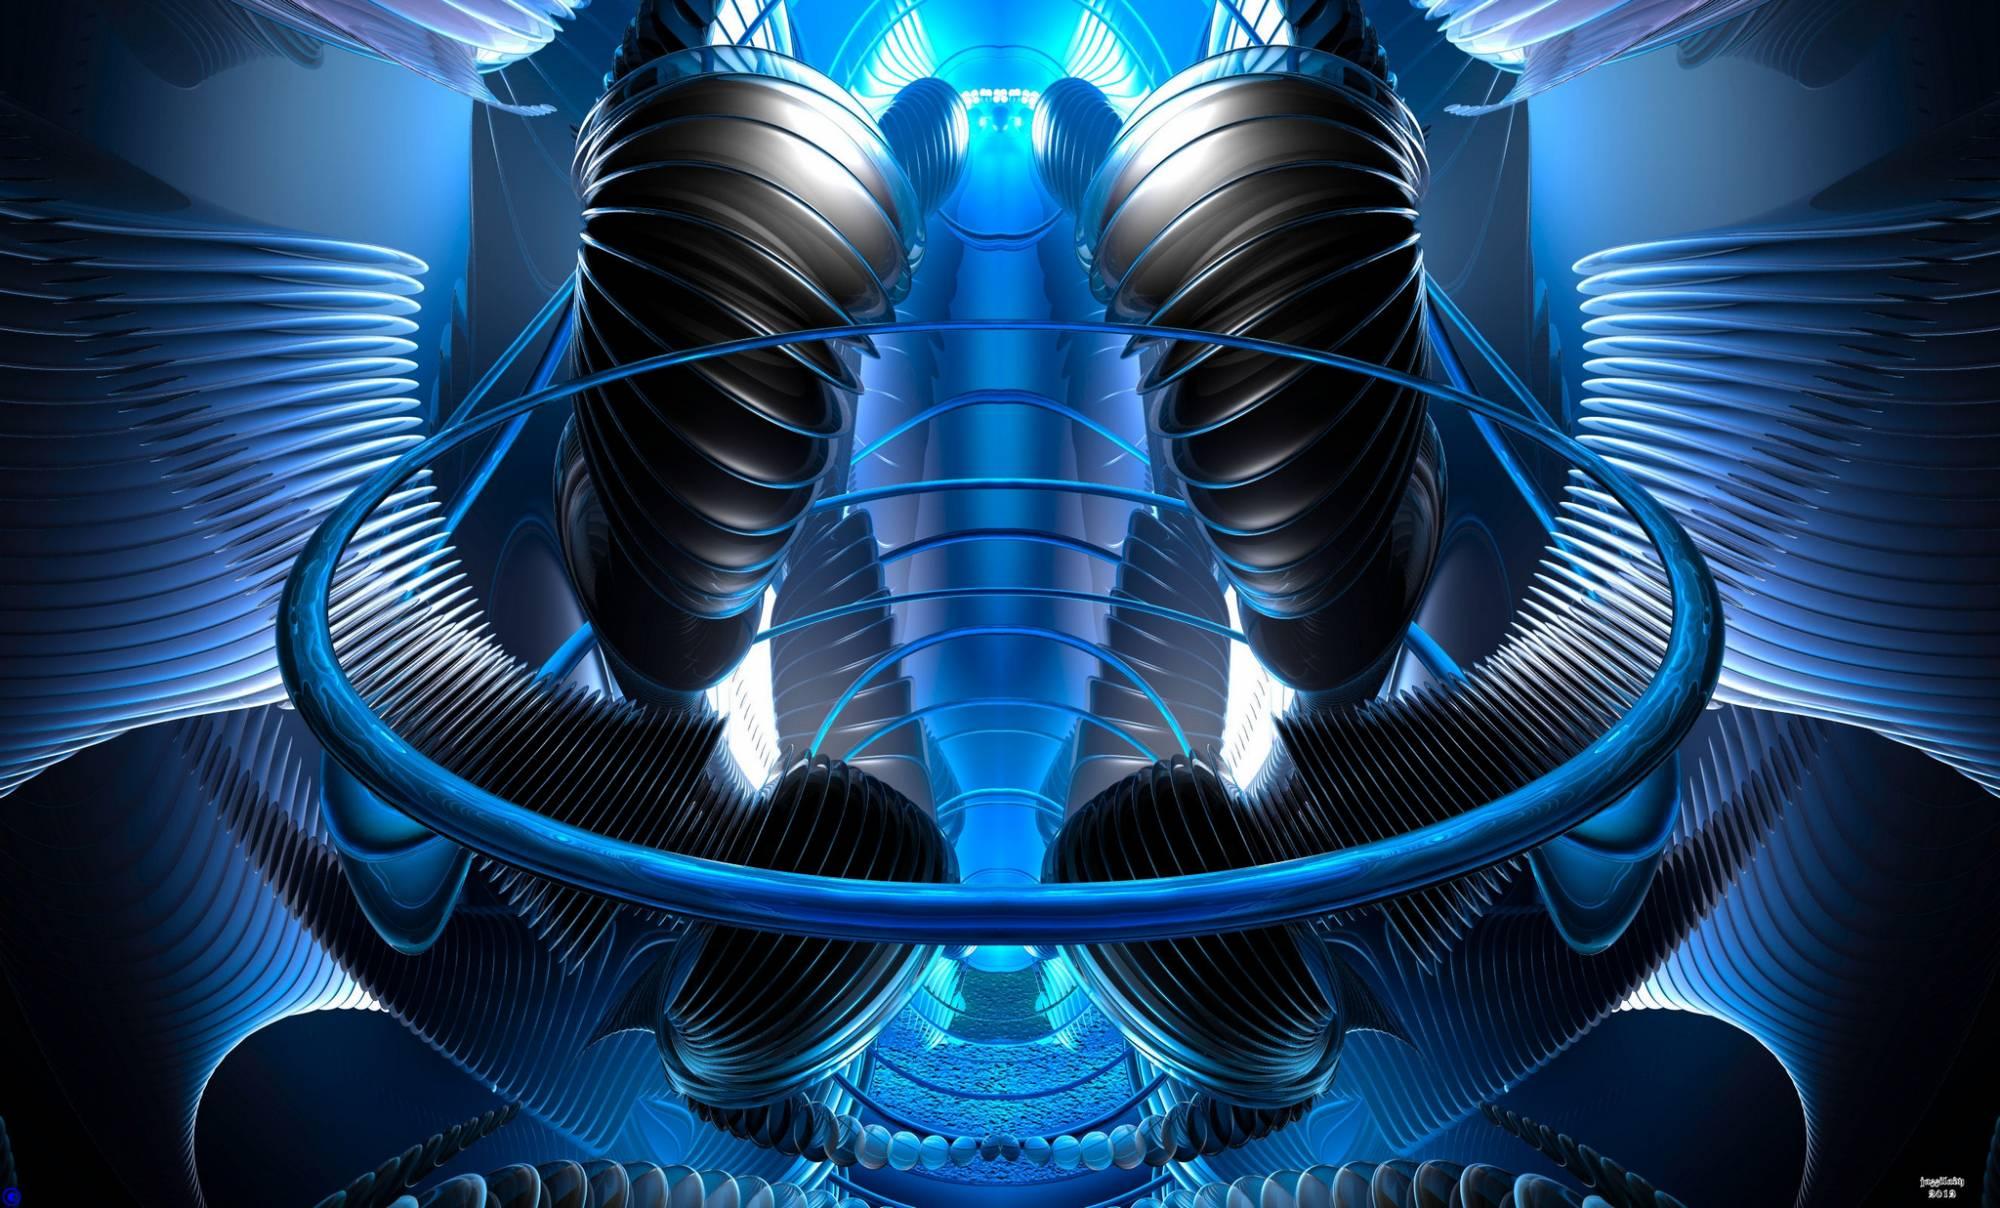 Chidas Para Fondo De Escritorio 3d: 3D Full HD Wallpaper And Background Image